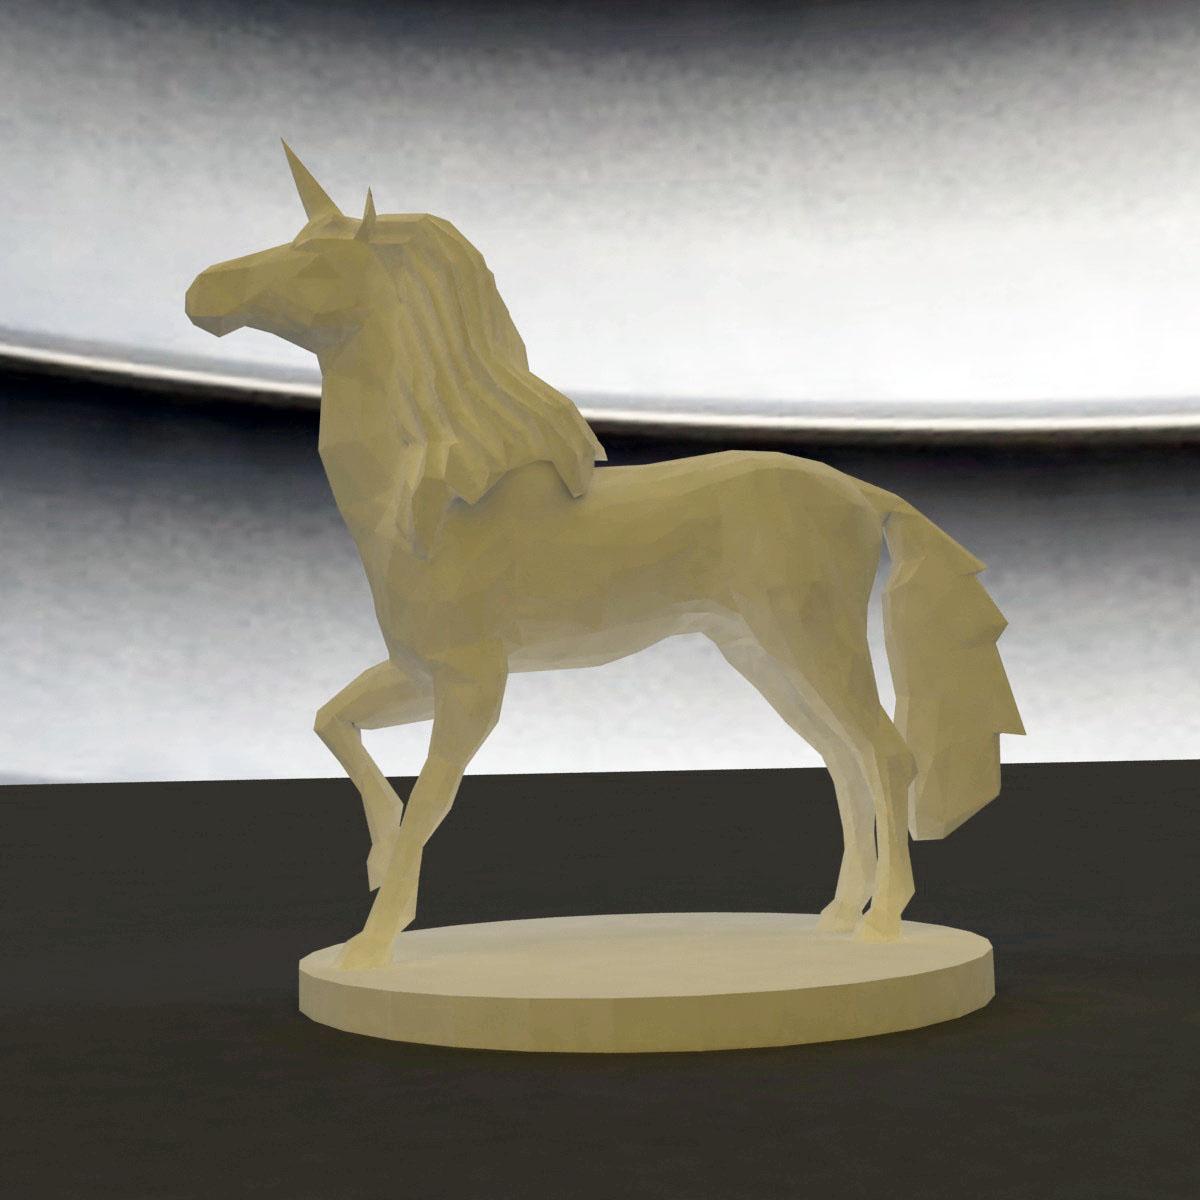 3d Printed Unicorn Low Poly By Zbrushingmx Pinshape